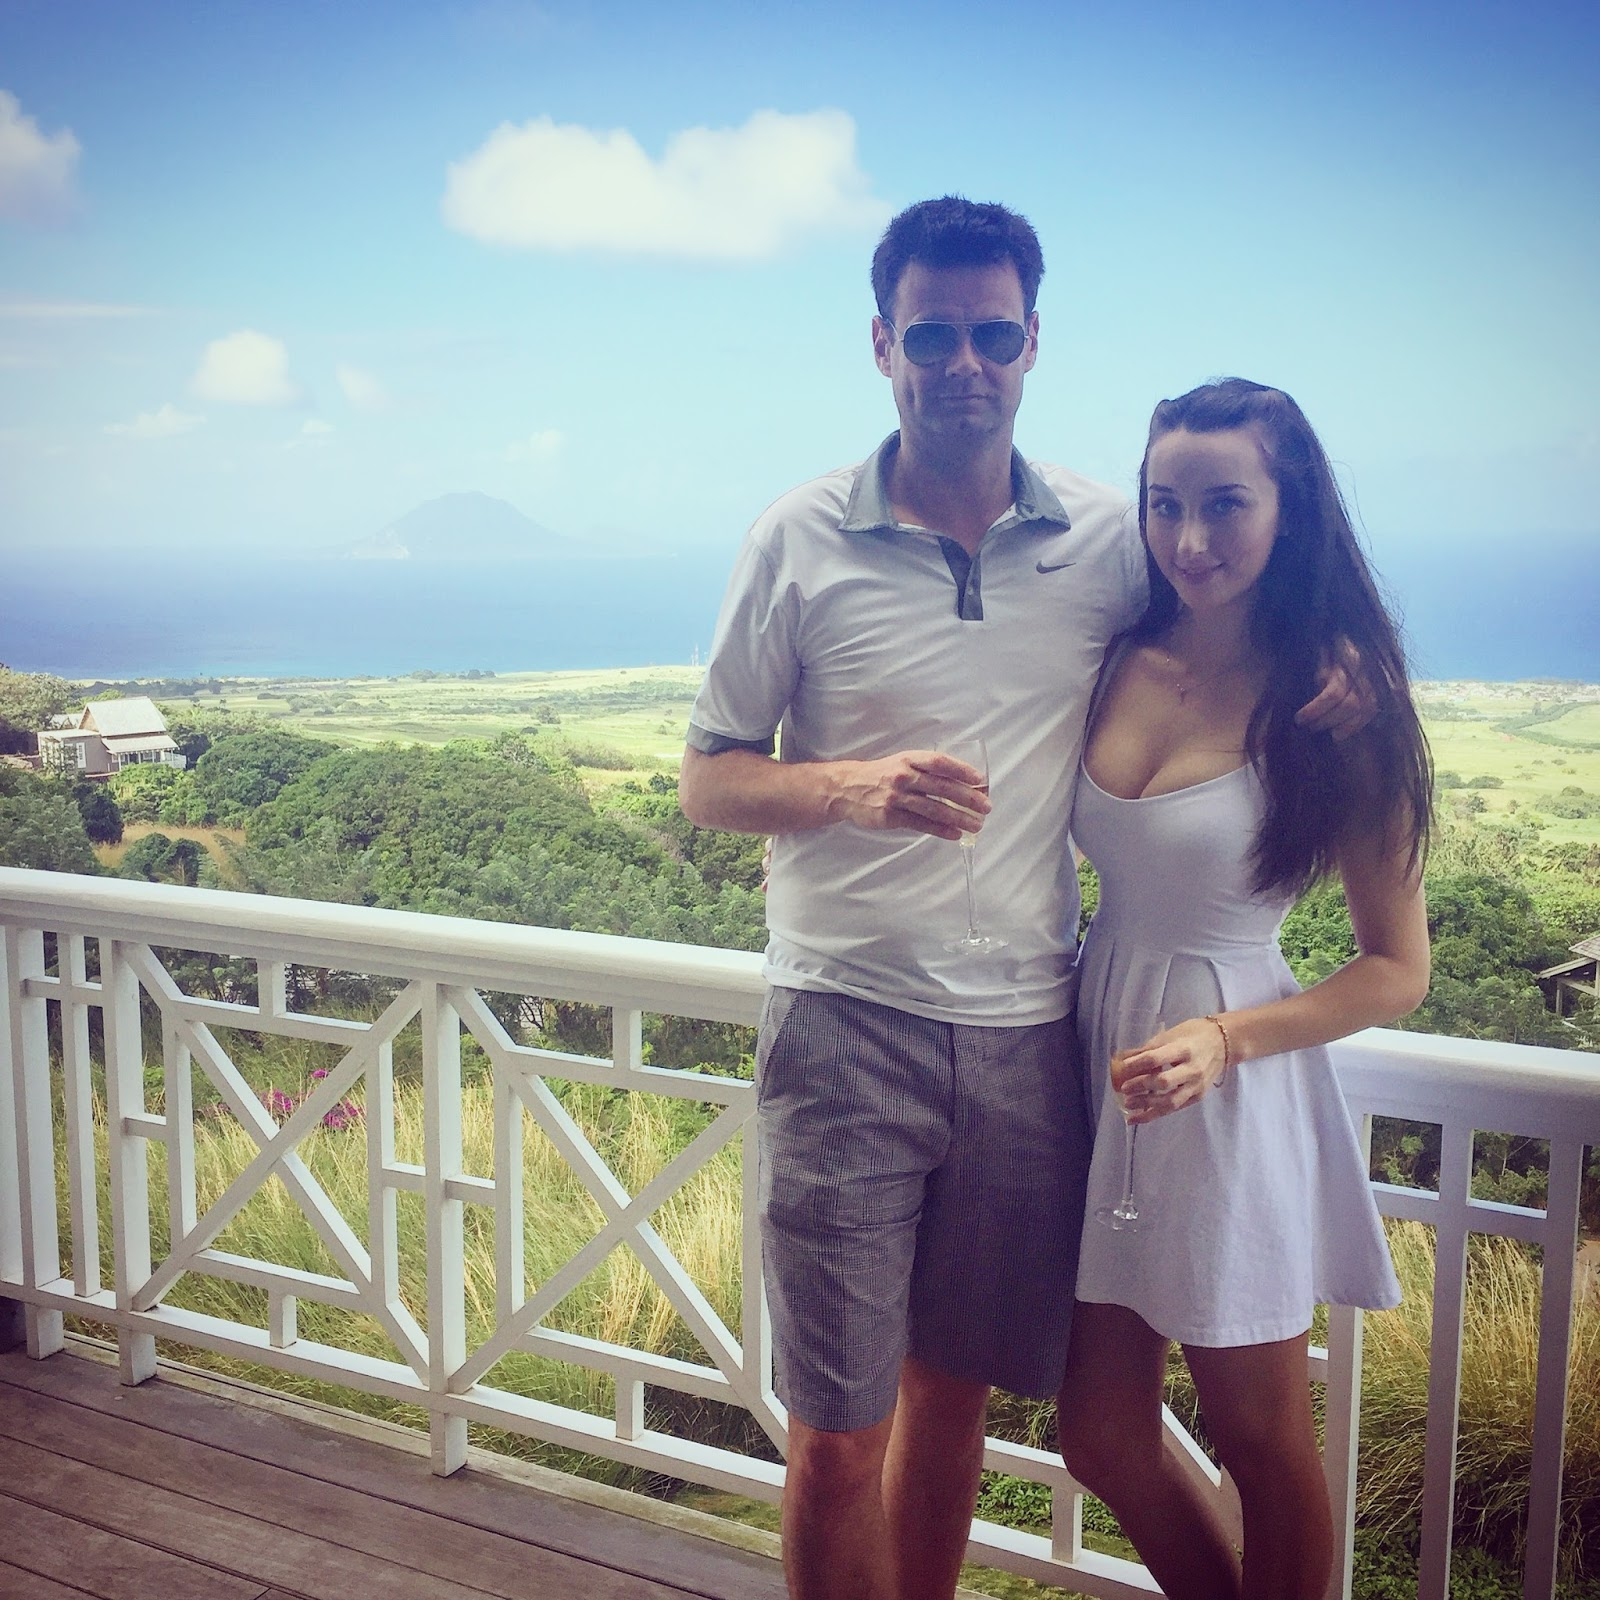 Couple Picture Caribbean, Boyfriend, Girlfriend, Champagne, Beach, St Kitts, Kittitian Hill